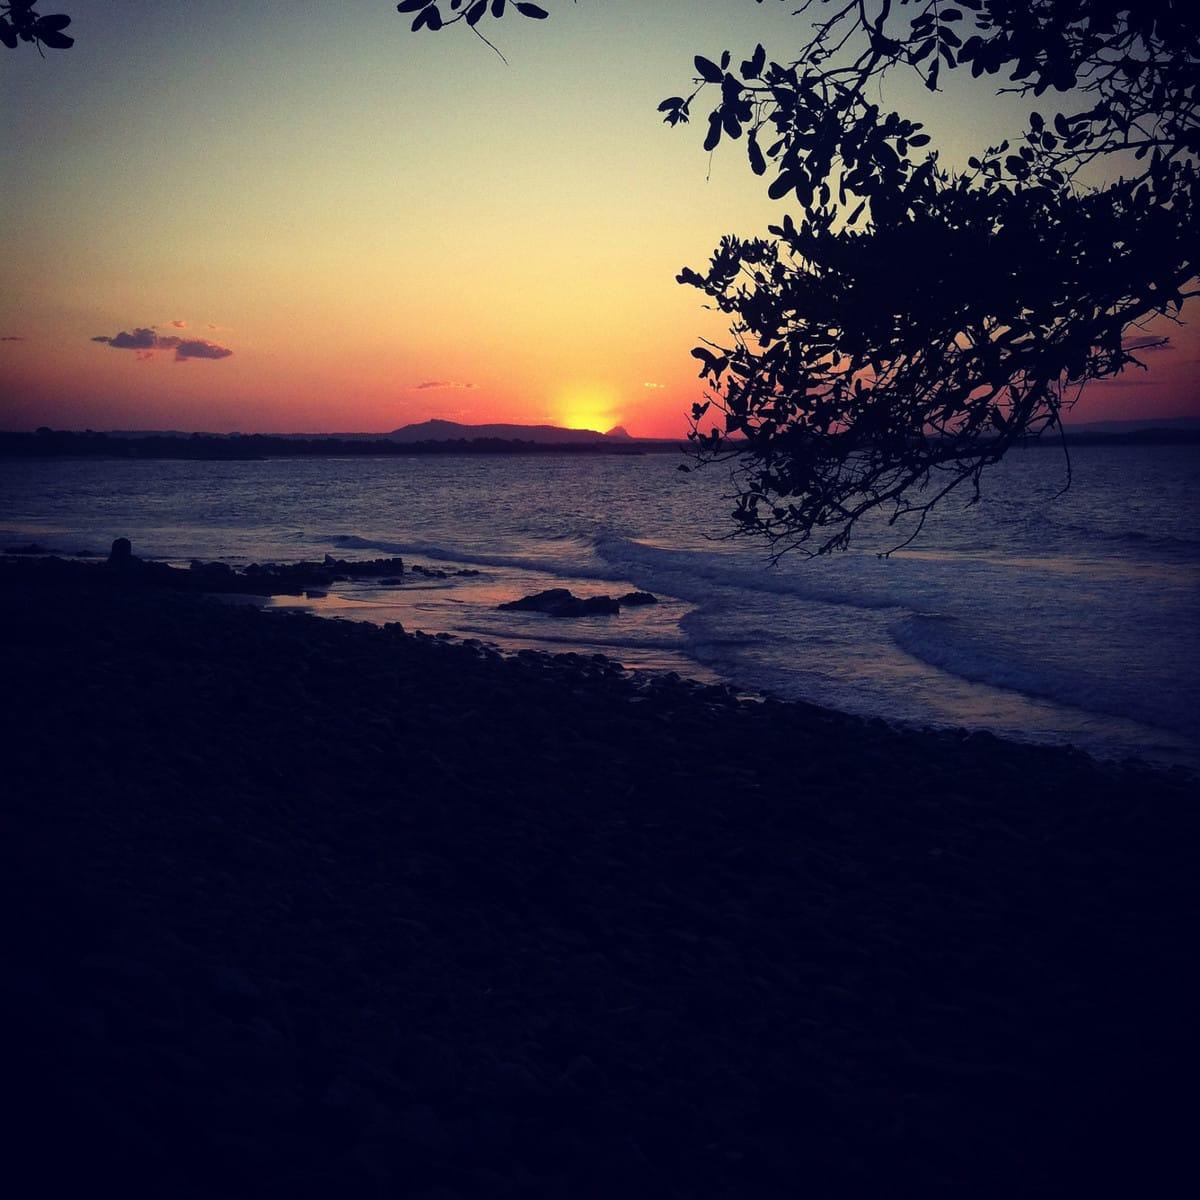 Sunset #2